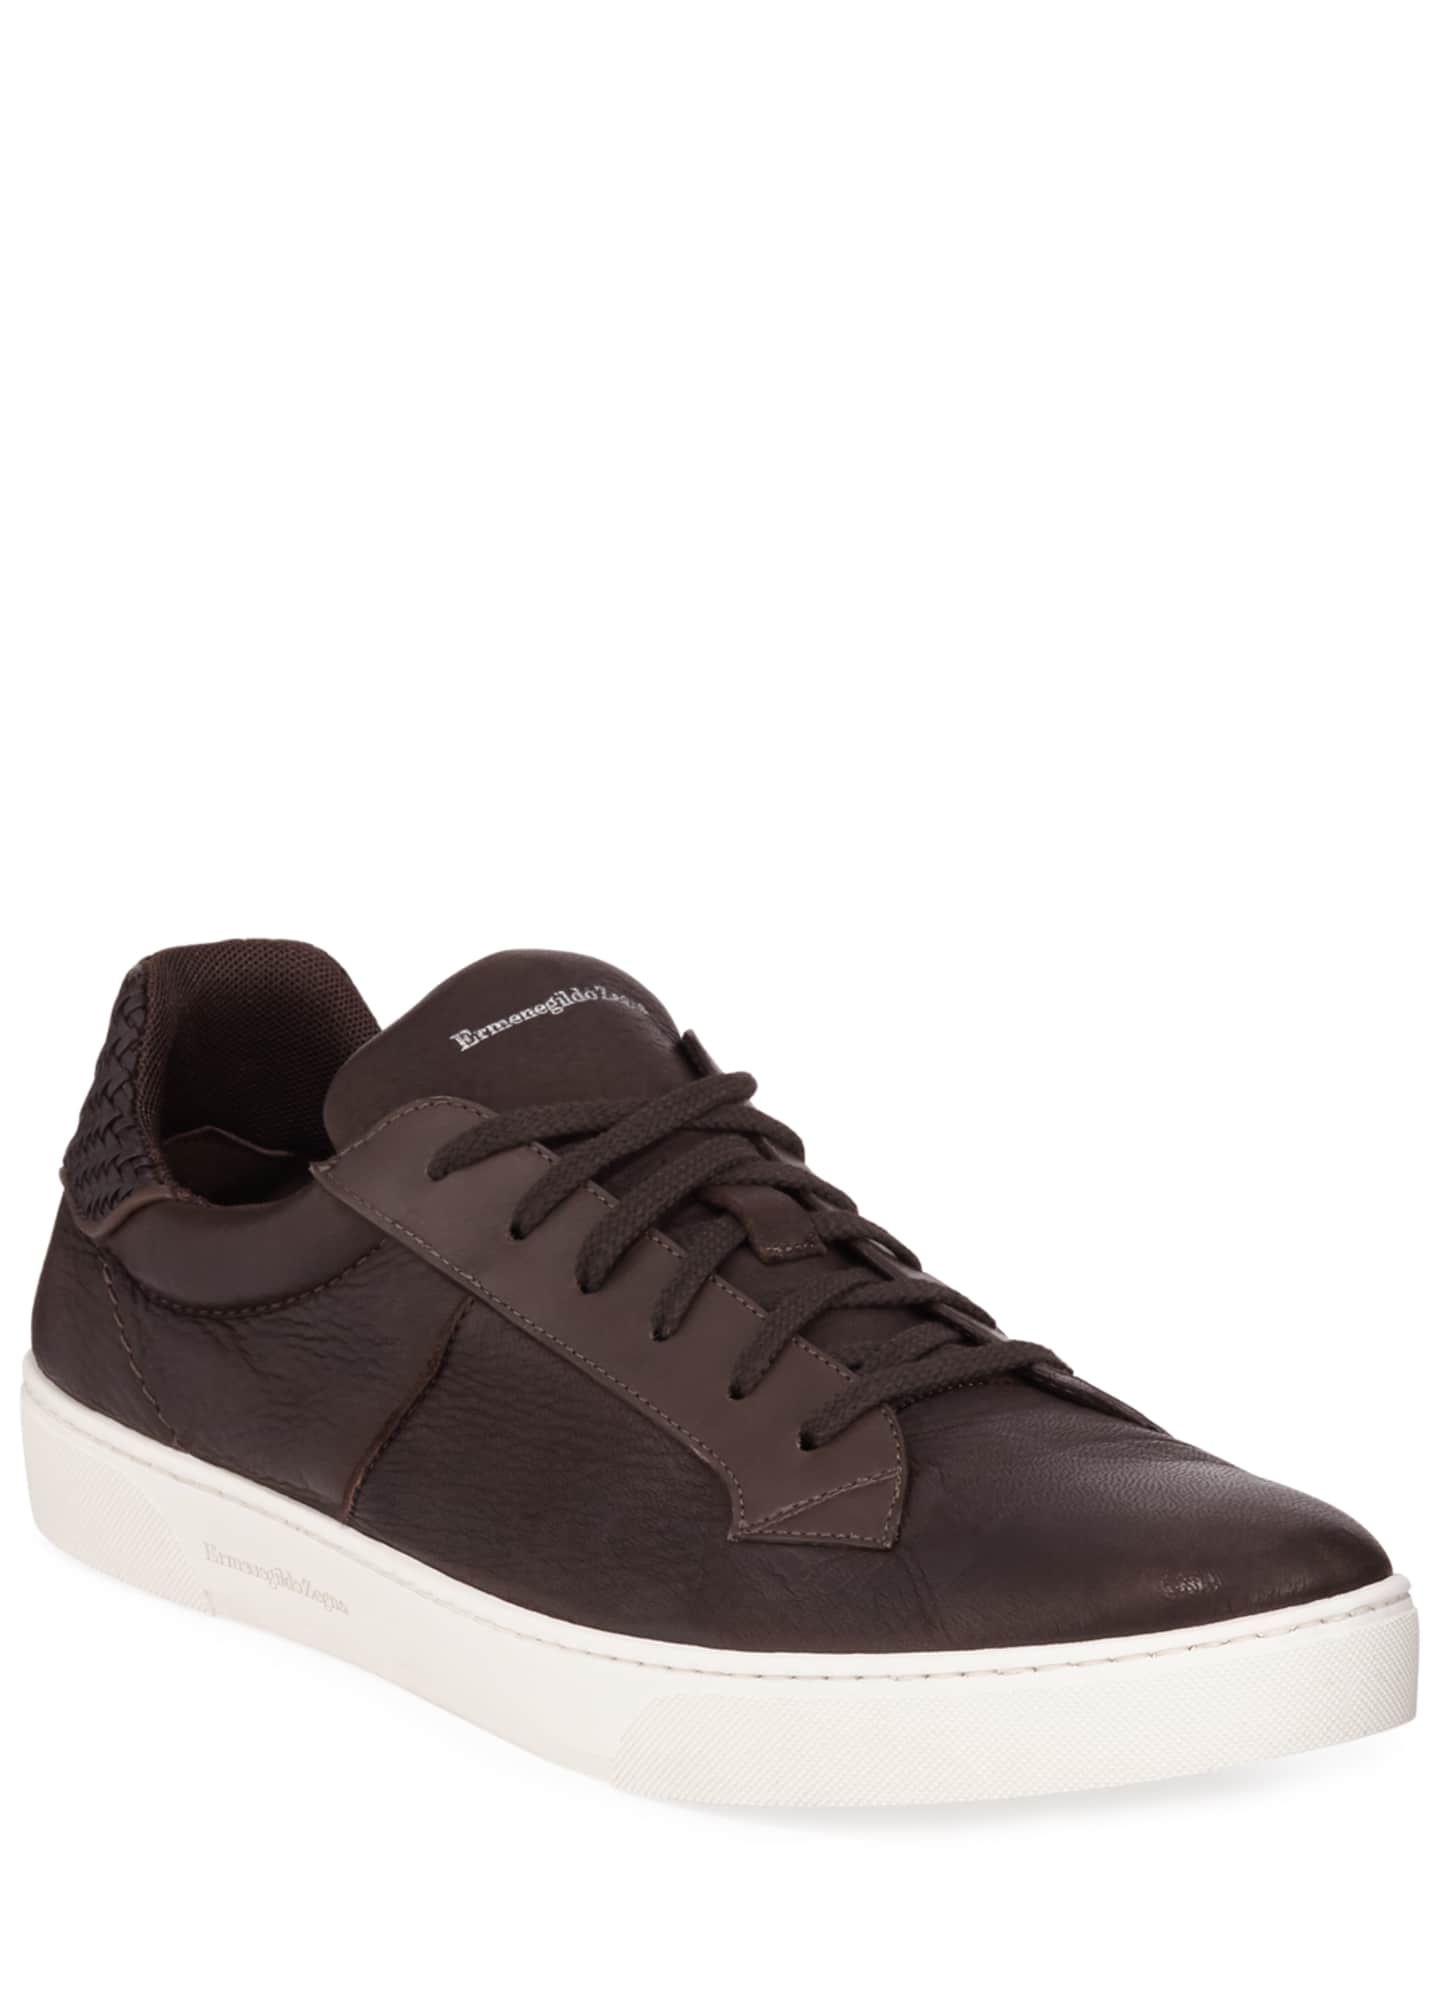 Ermenegildo Zegna Men's Vulcanizzato Deerskin Leather Low-Top